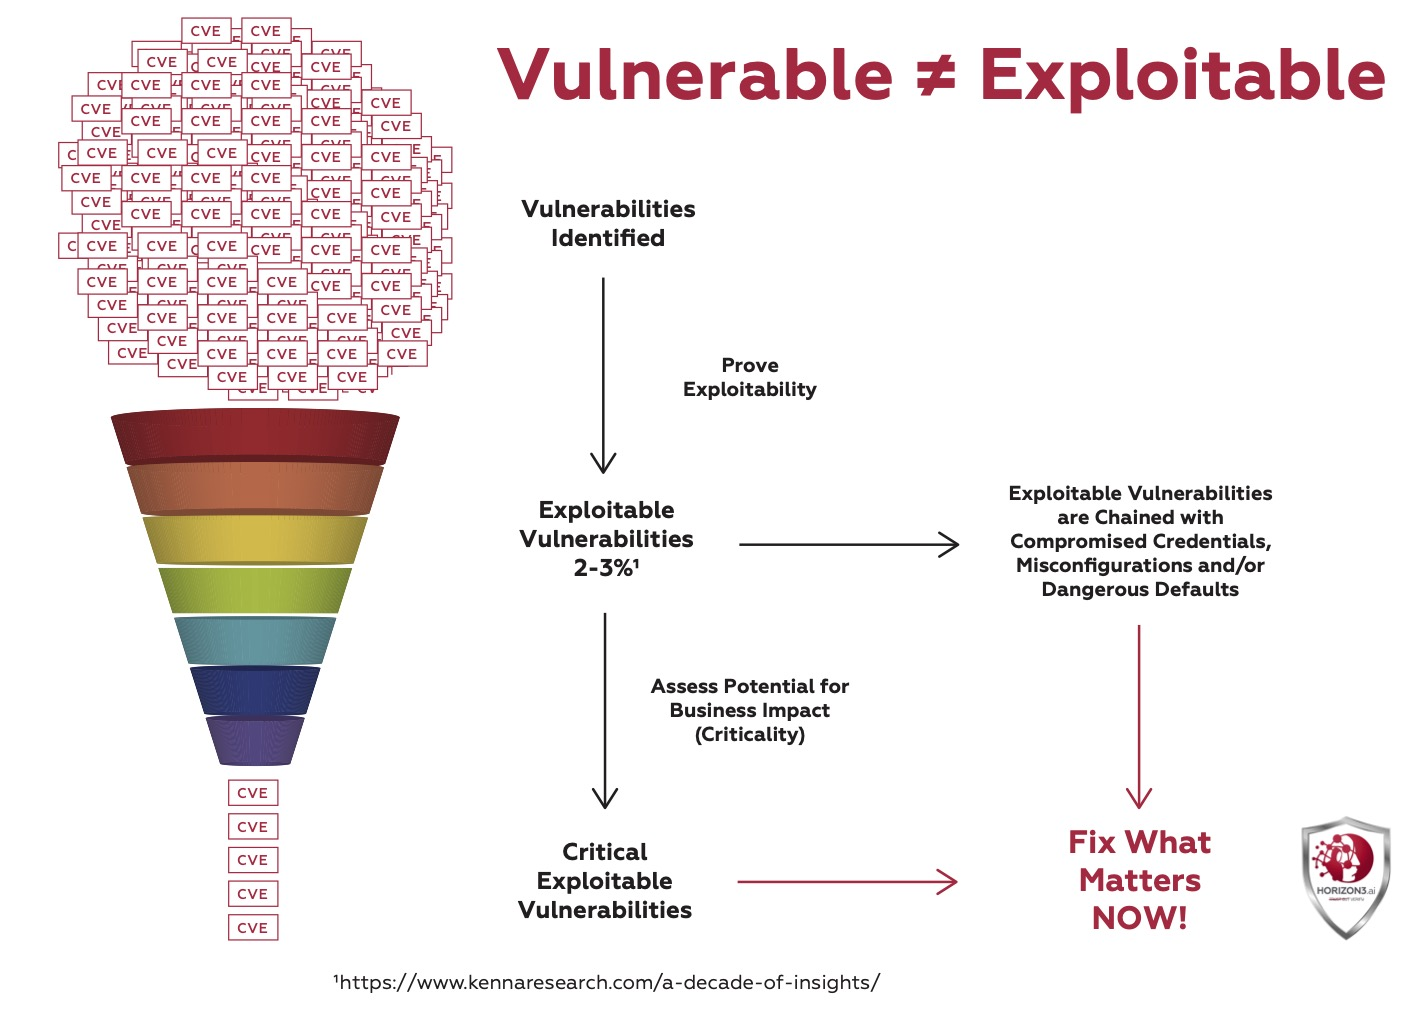 Vulnerable ≠ Exploitable